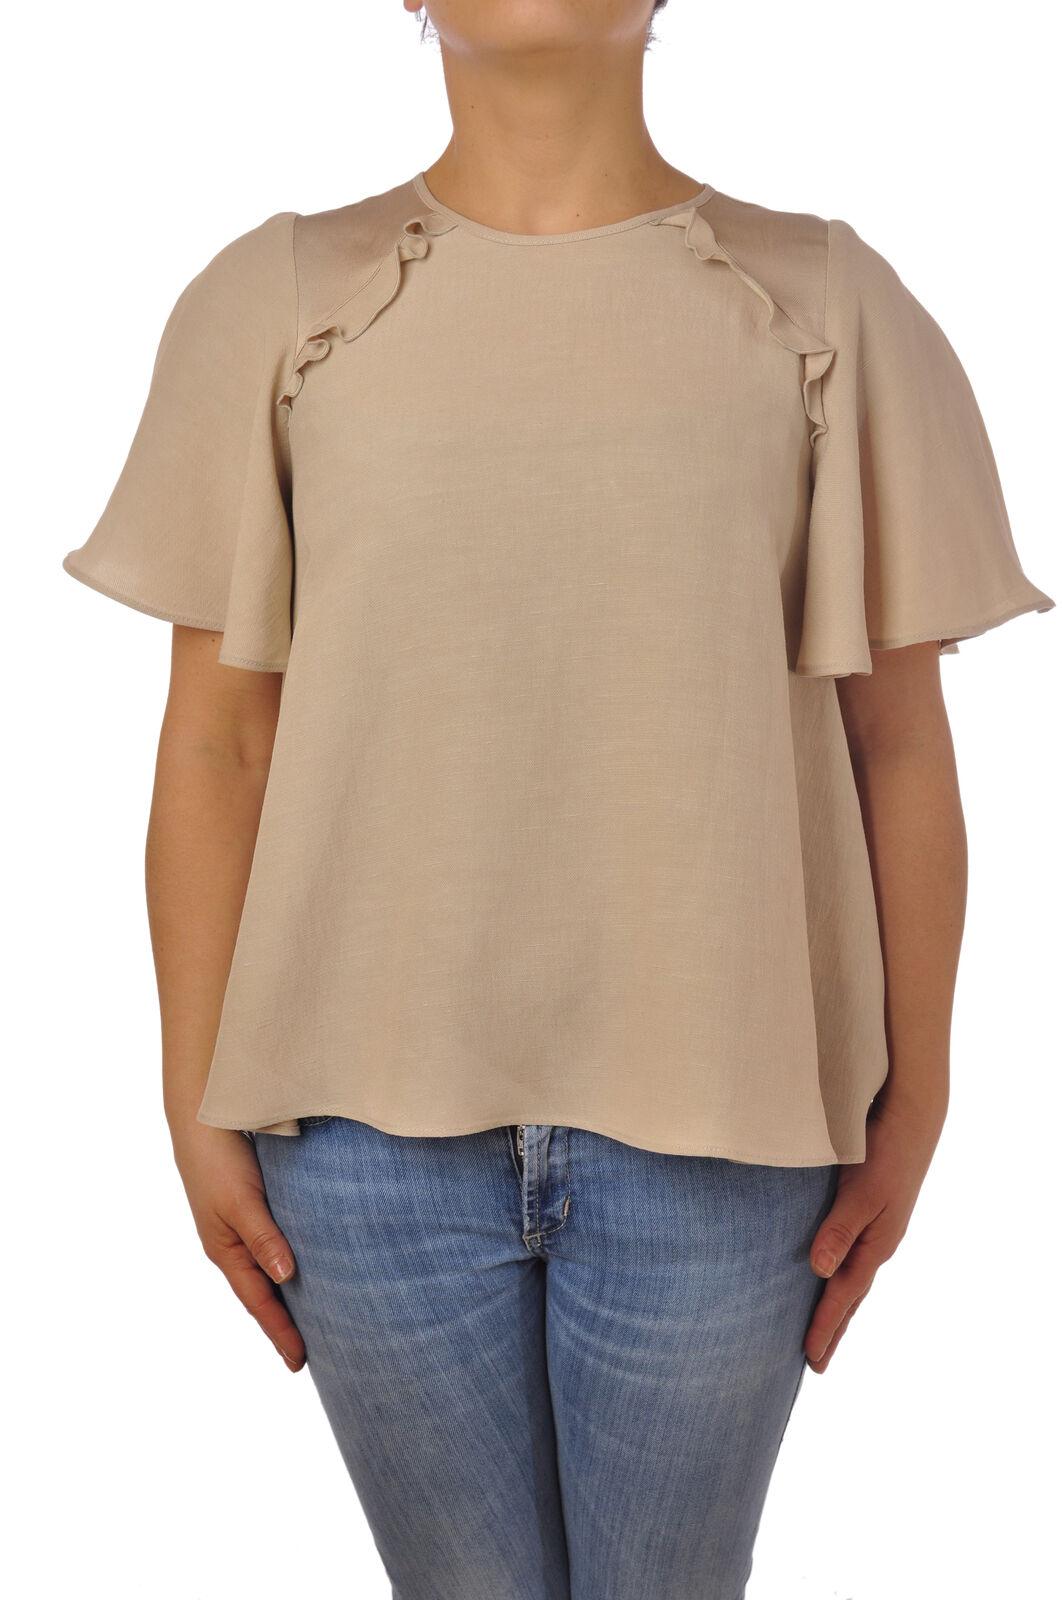 Twin Set - Shirts-Blouses  - Woman - Beige - 5106822F180638  Tienda de moda y compras online.